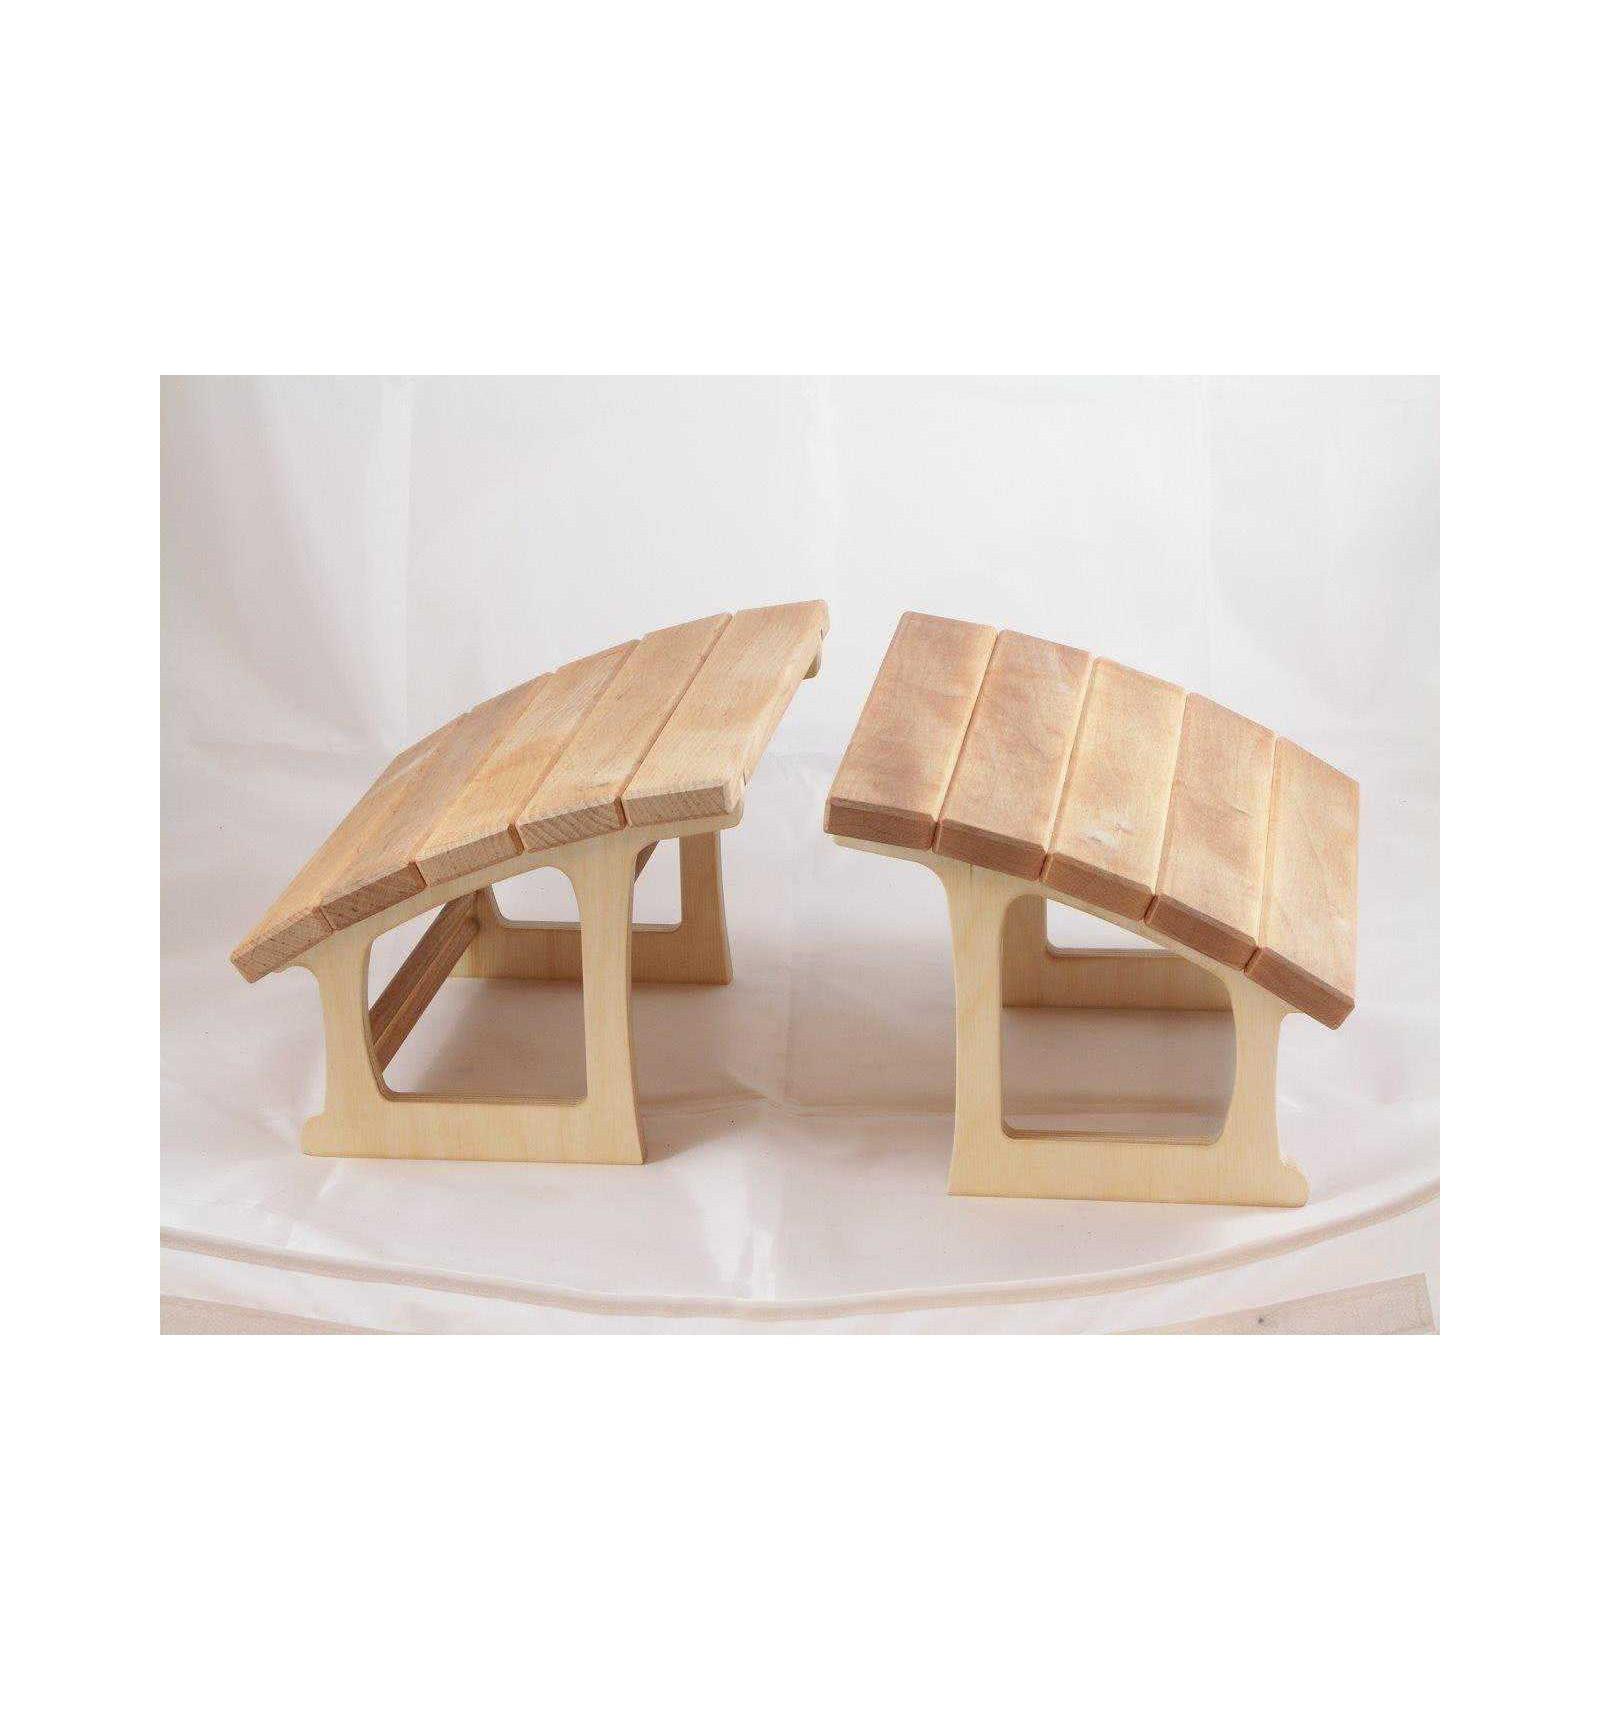 bauernhof stall aus holz decor spielzeug. Black Bedroom Furniture Sets. Home Design Ideas